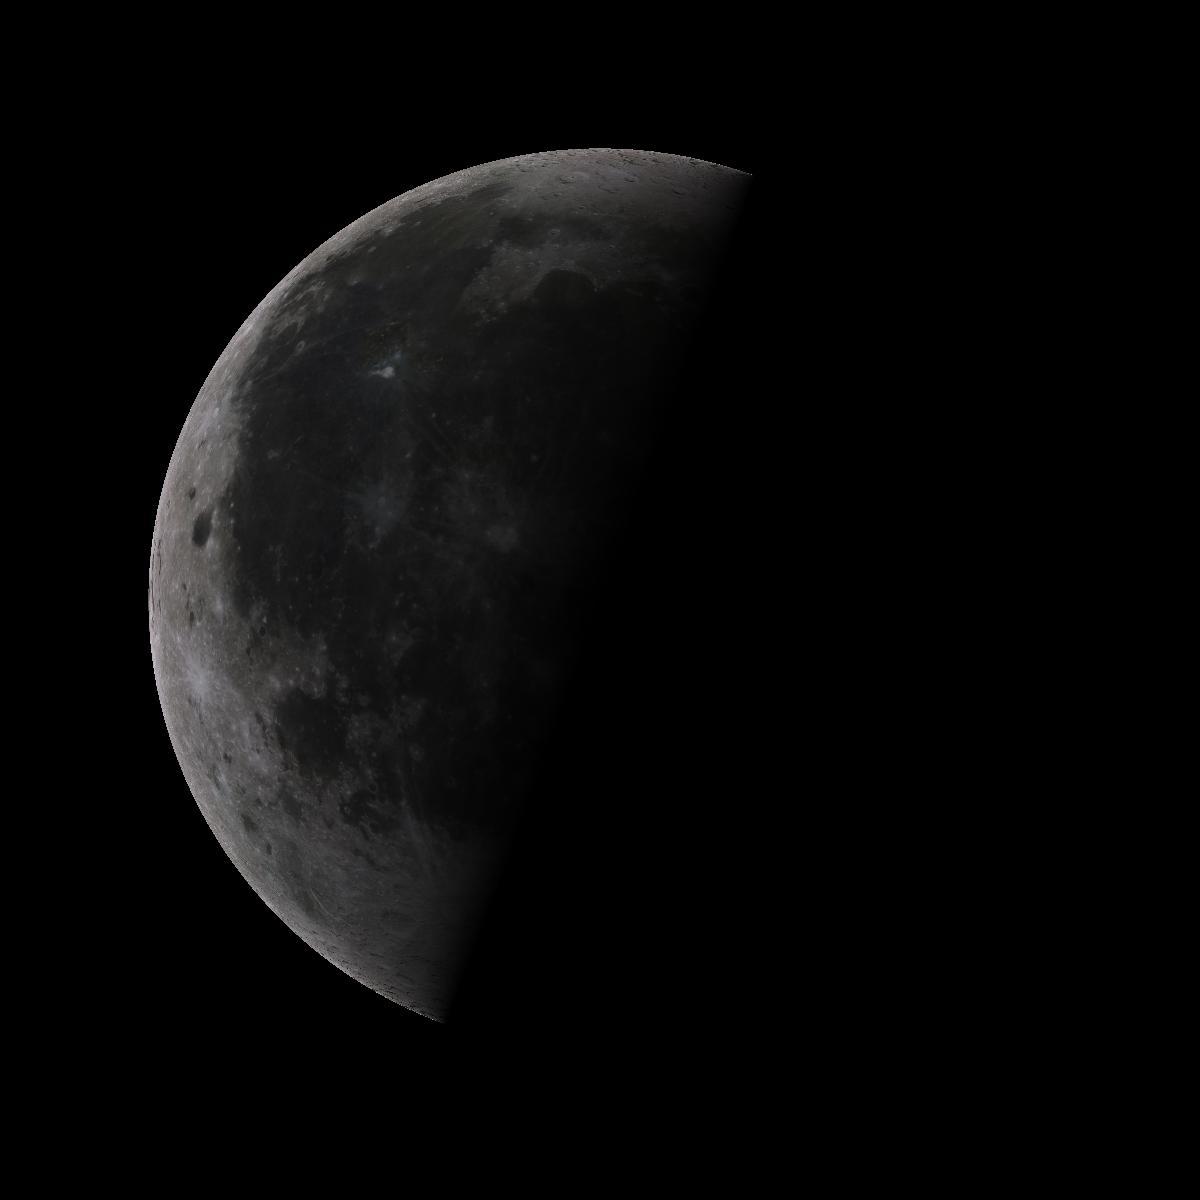 Lune du 25 juillet 2019